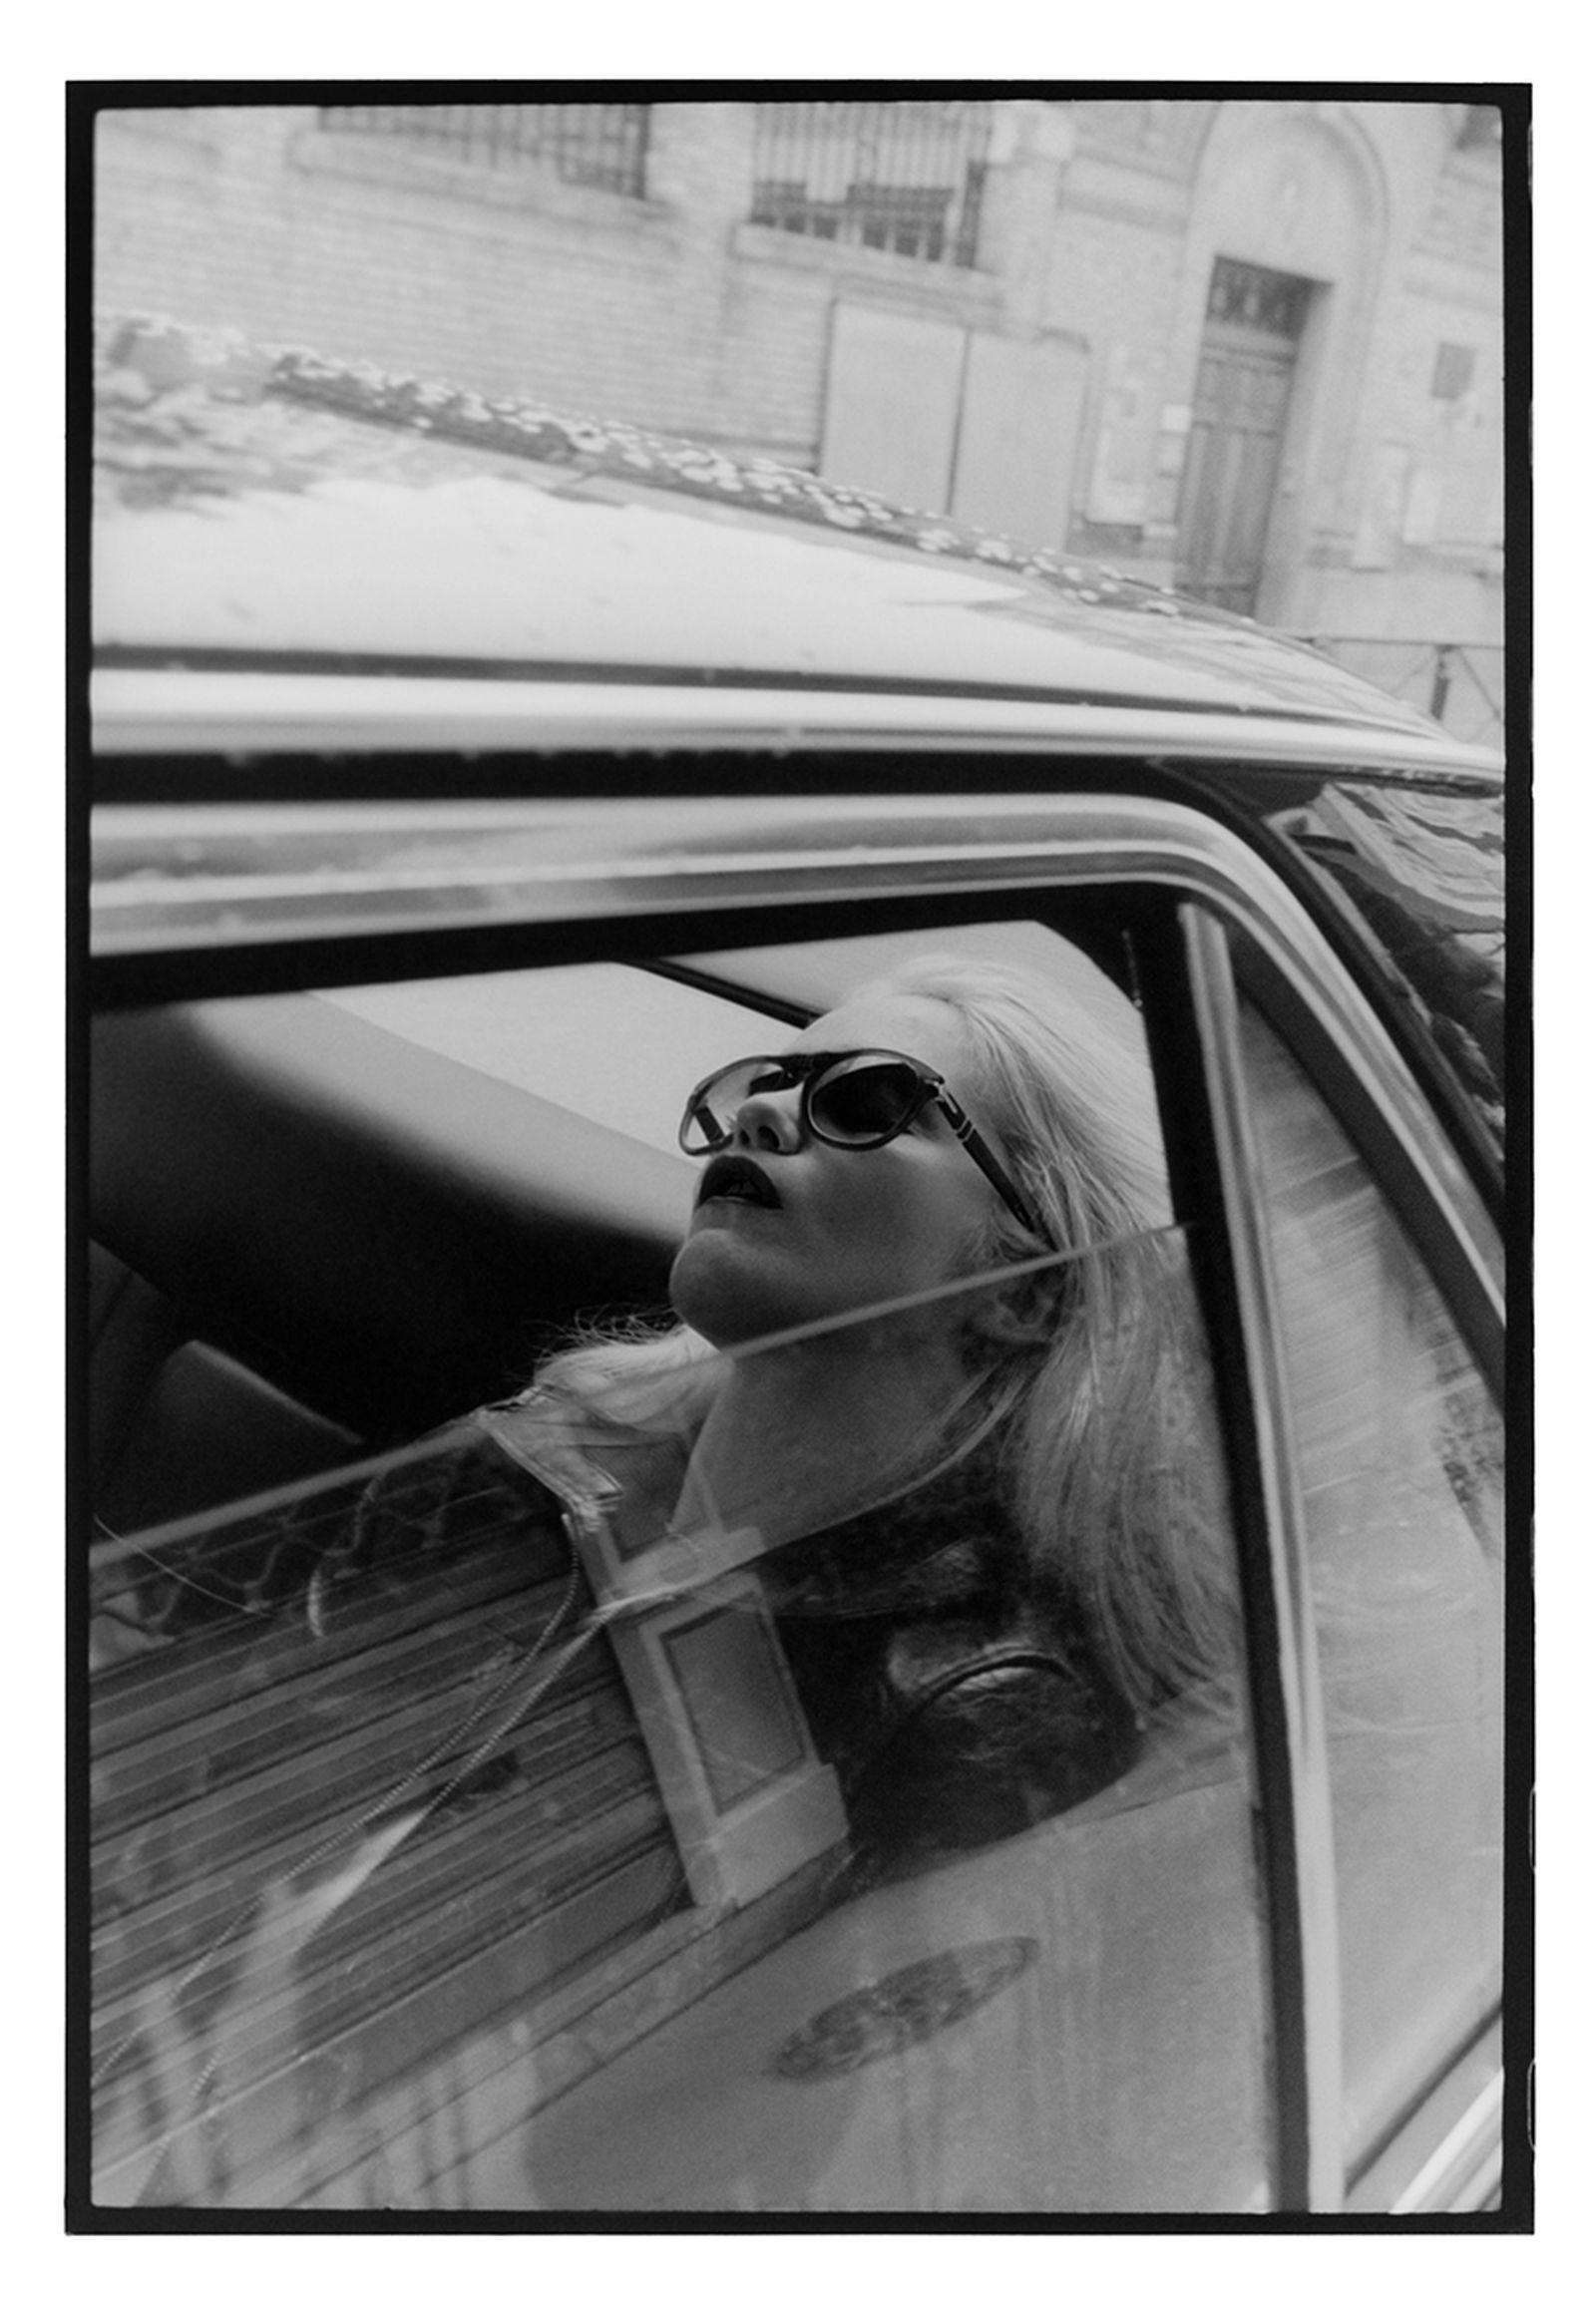 Sky Ferreira A.P.C. Persol Sunglasses